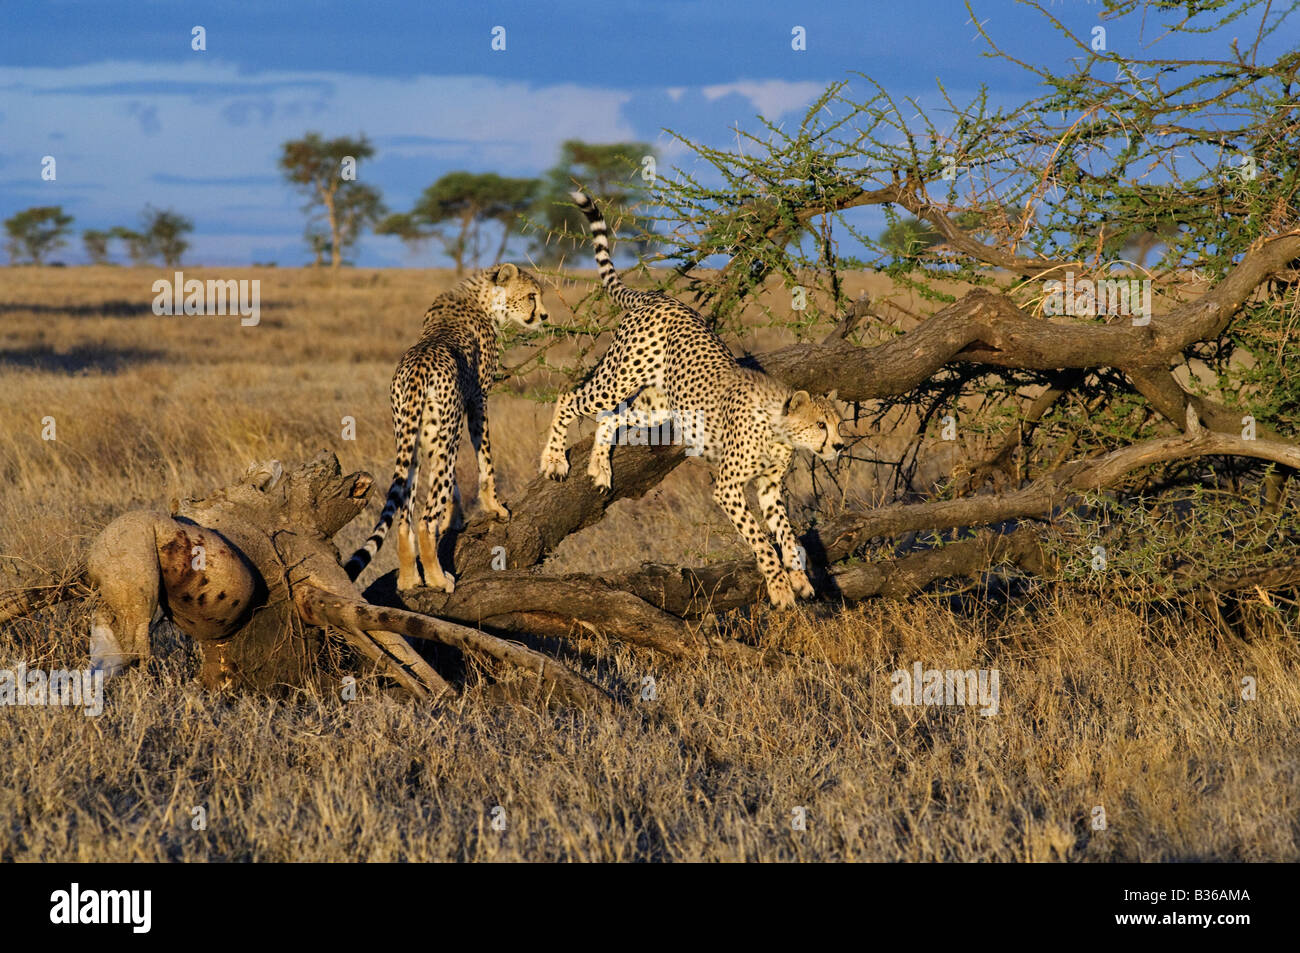 Cheetah litter mates playful adult cubs climbing a tree (Acinonyx jubatus), Ndutu, Ngorongoro, Tanzania - Stock Image